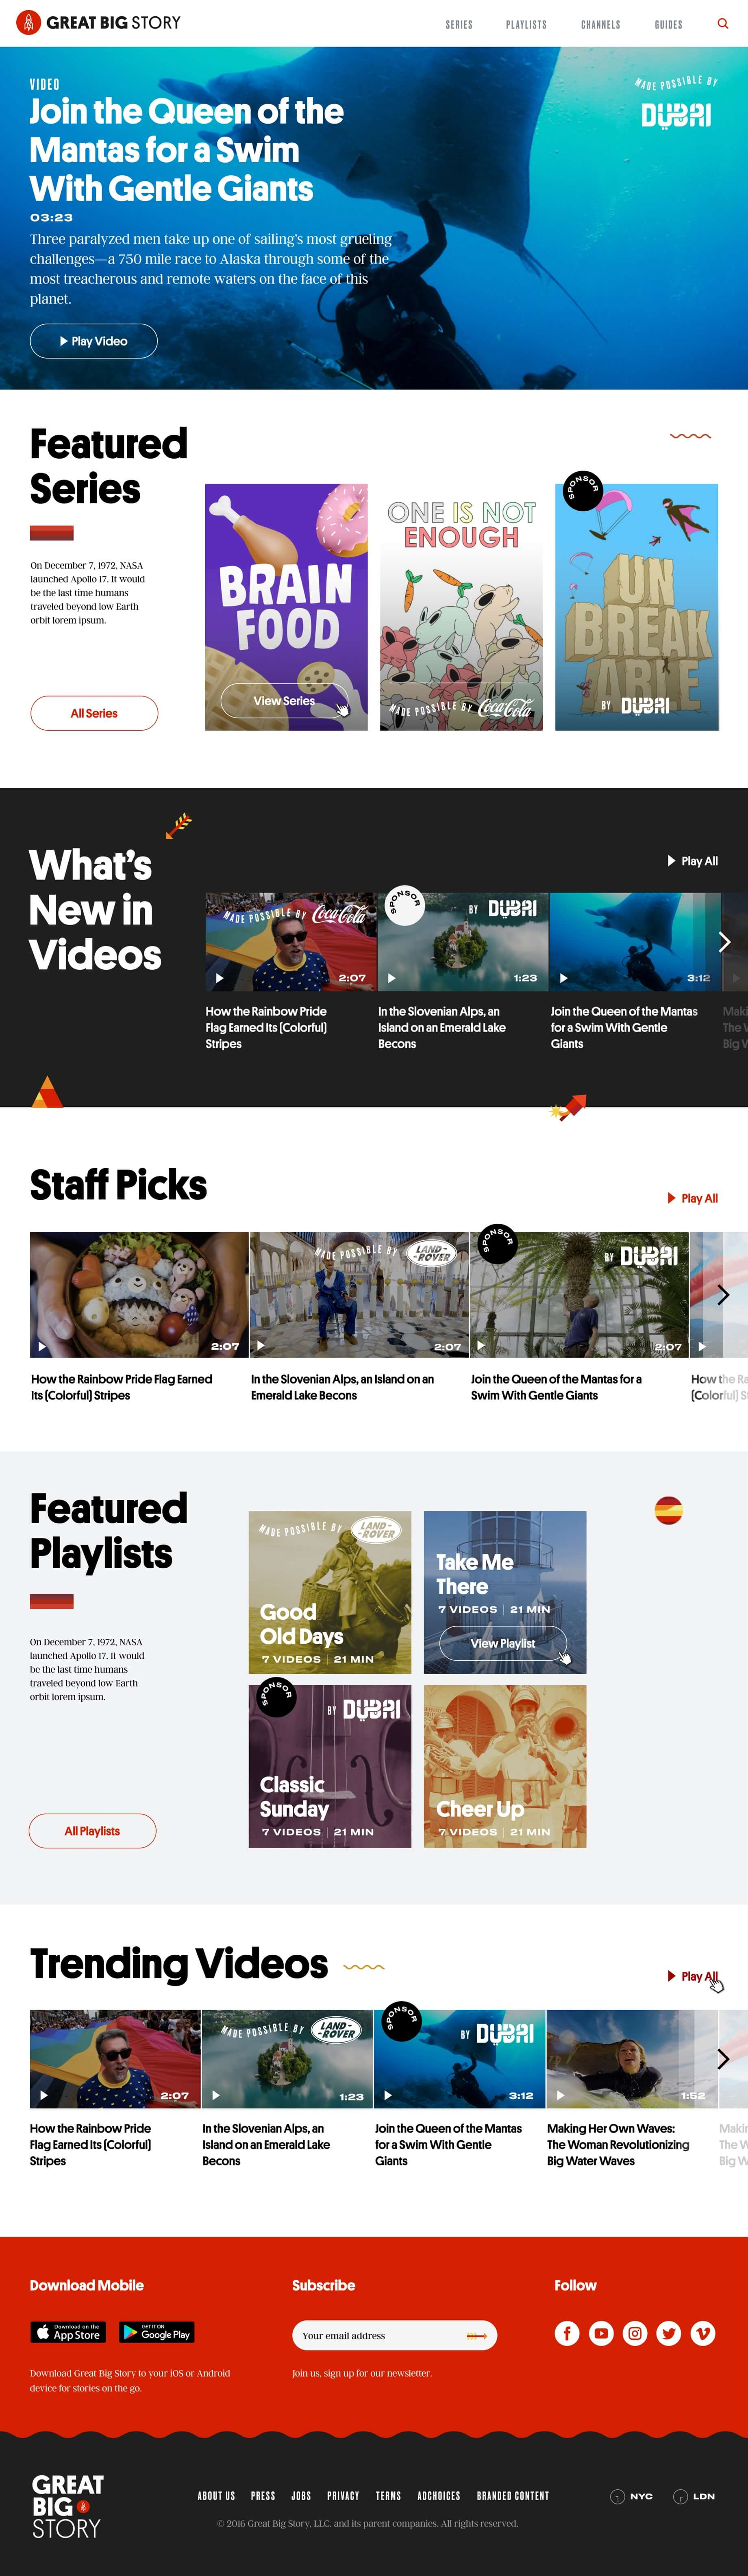 Great Big Story video platform image desktop